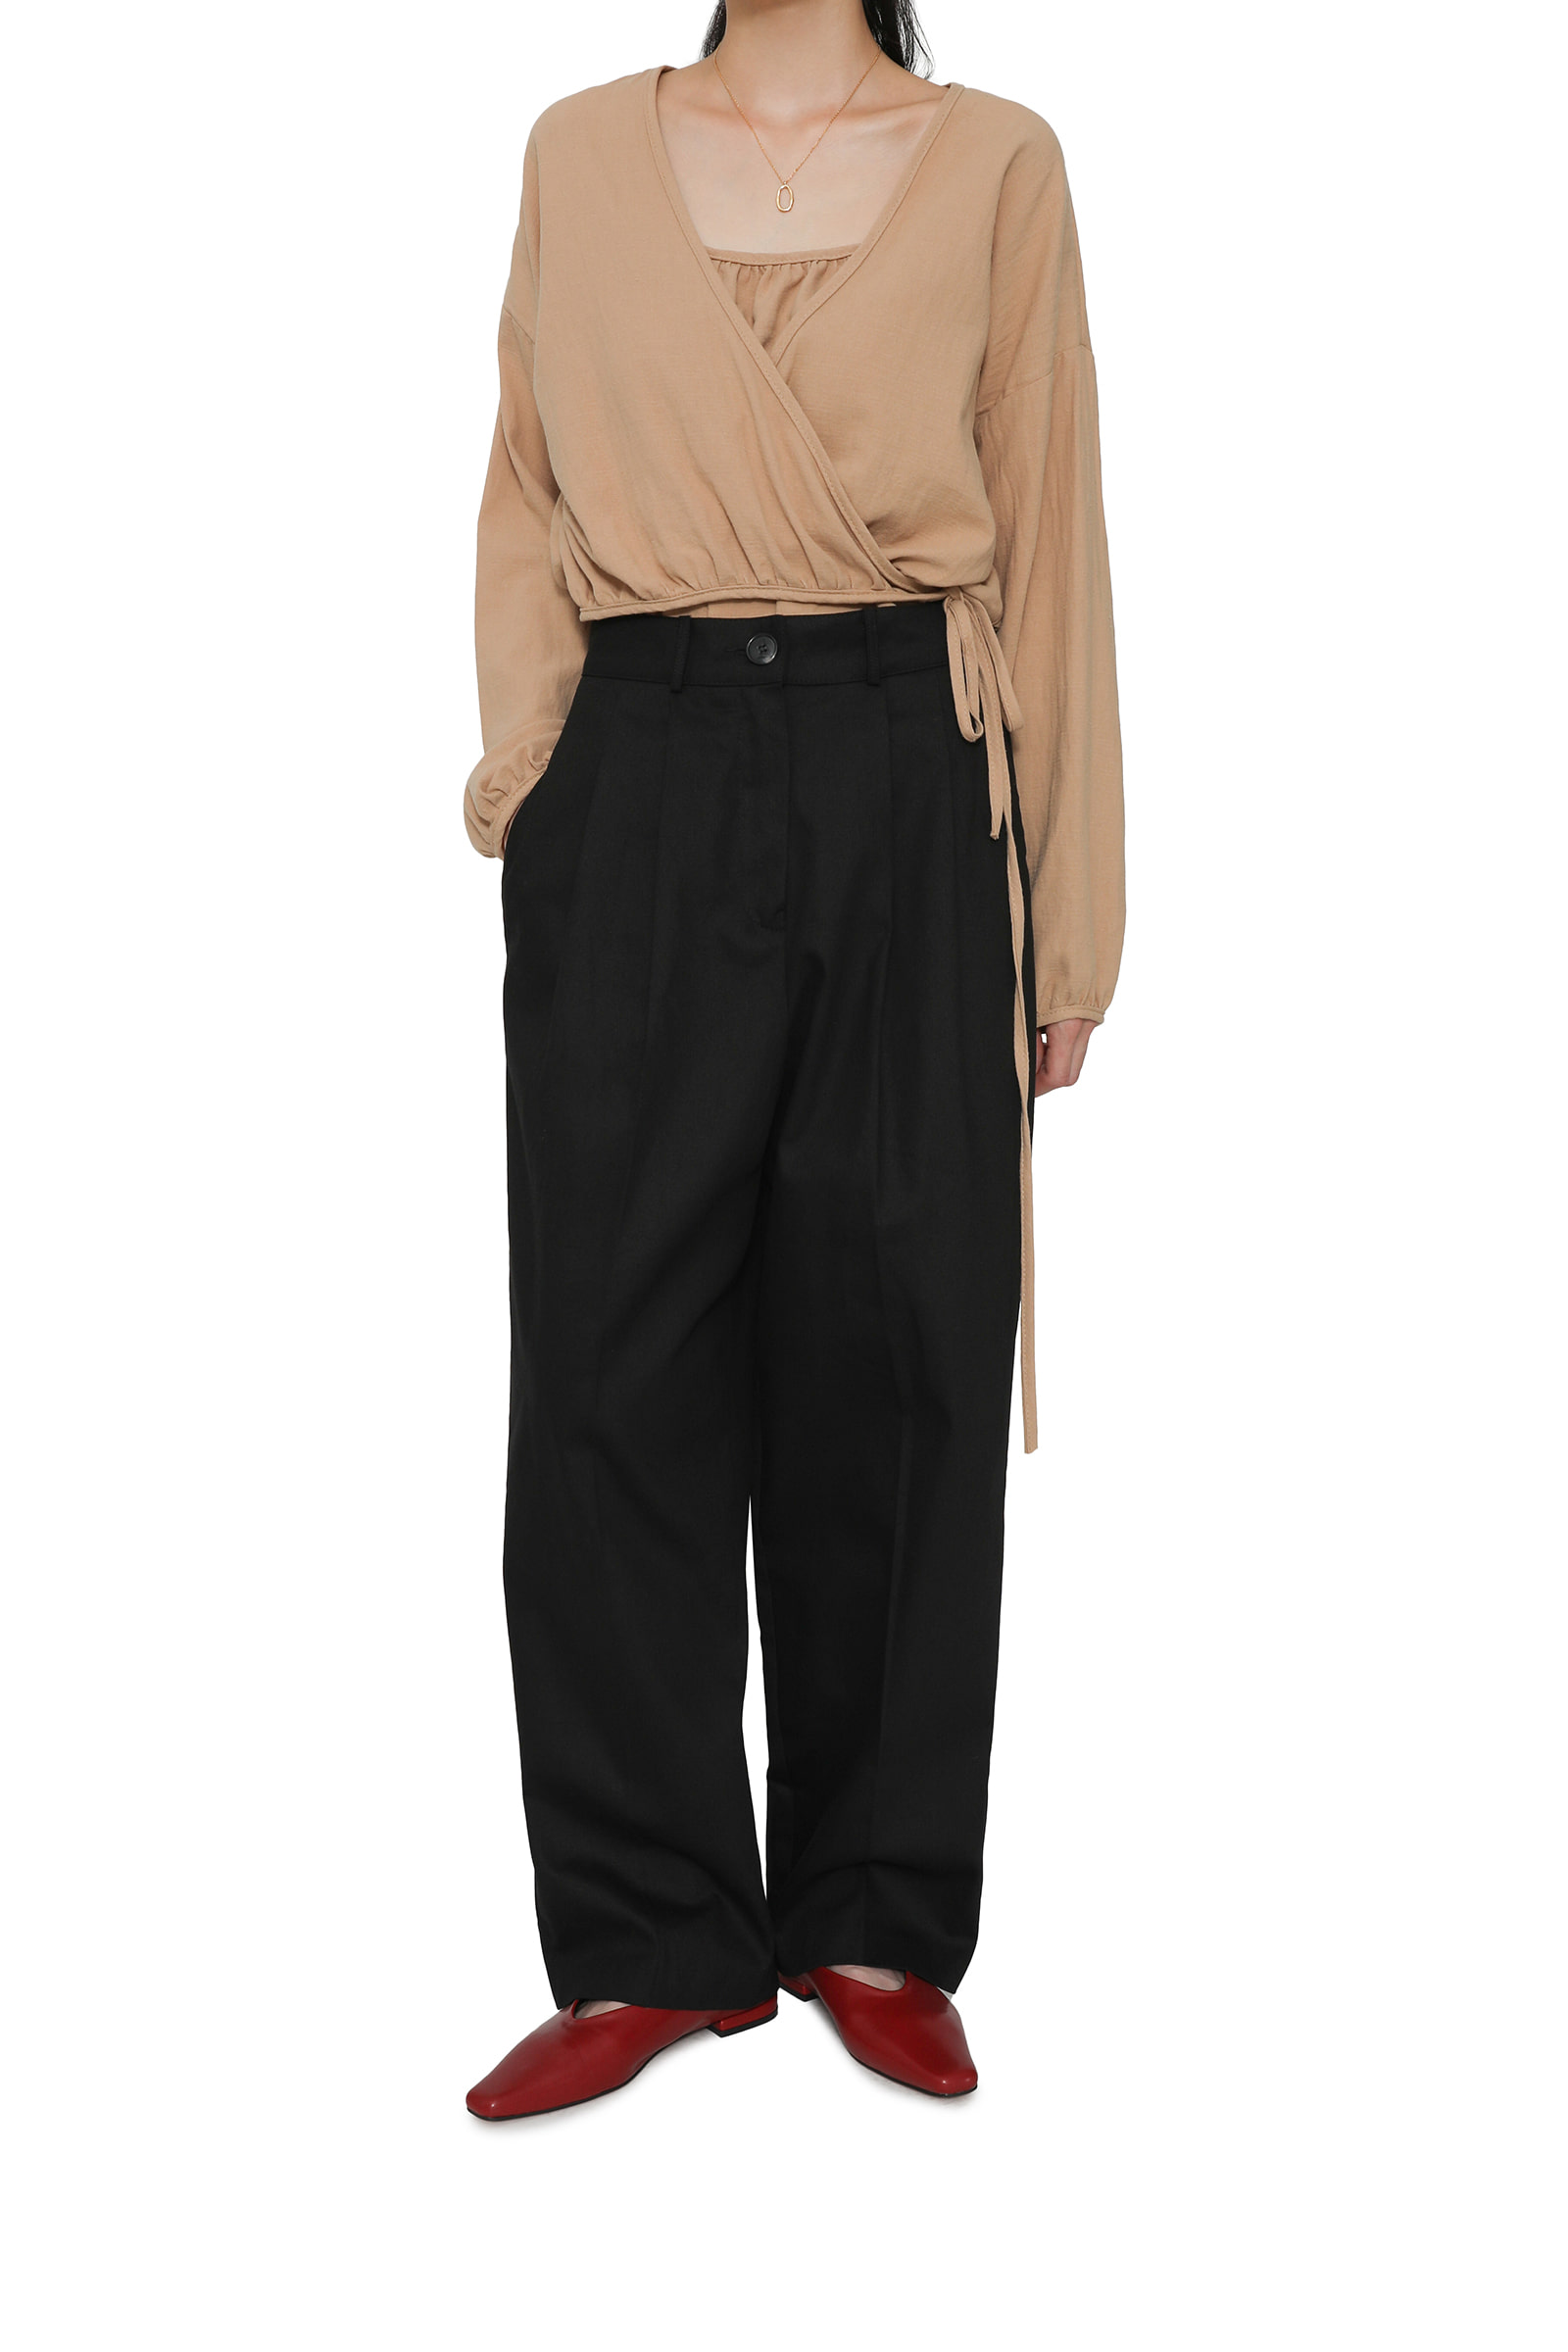 Original tapered slacks